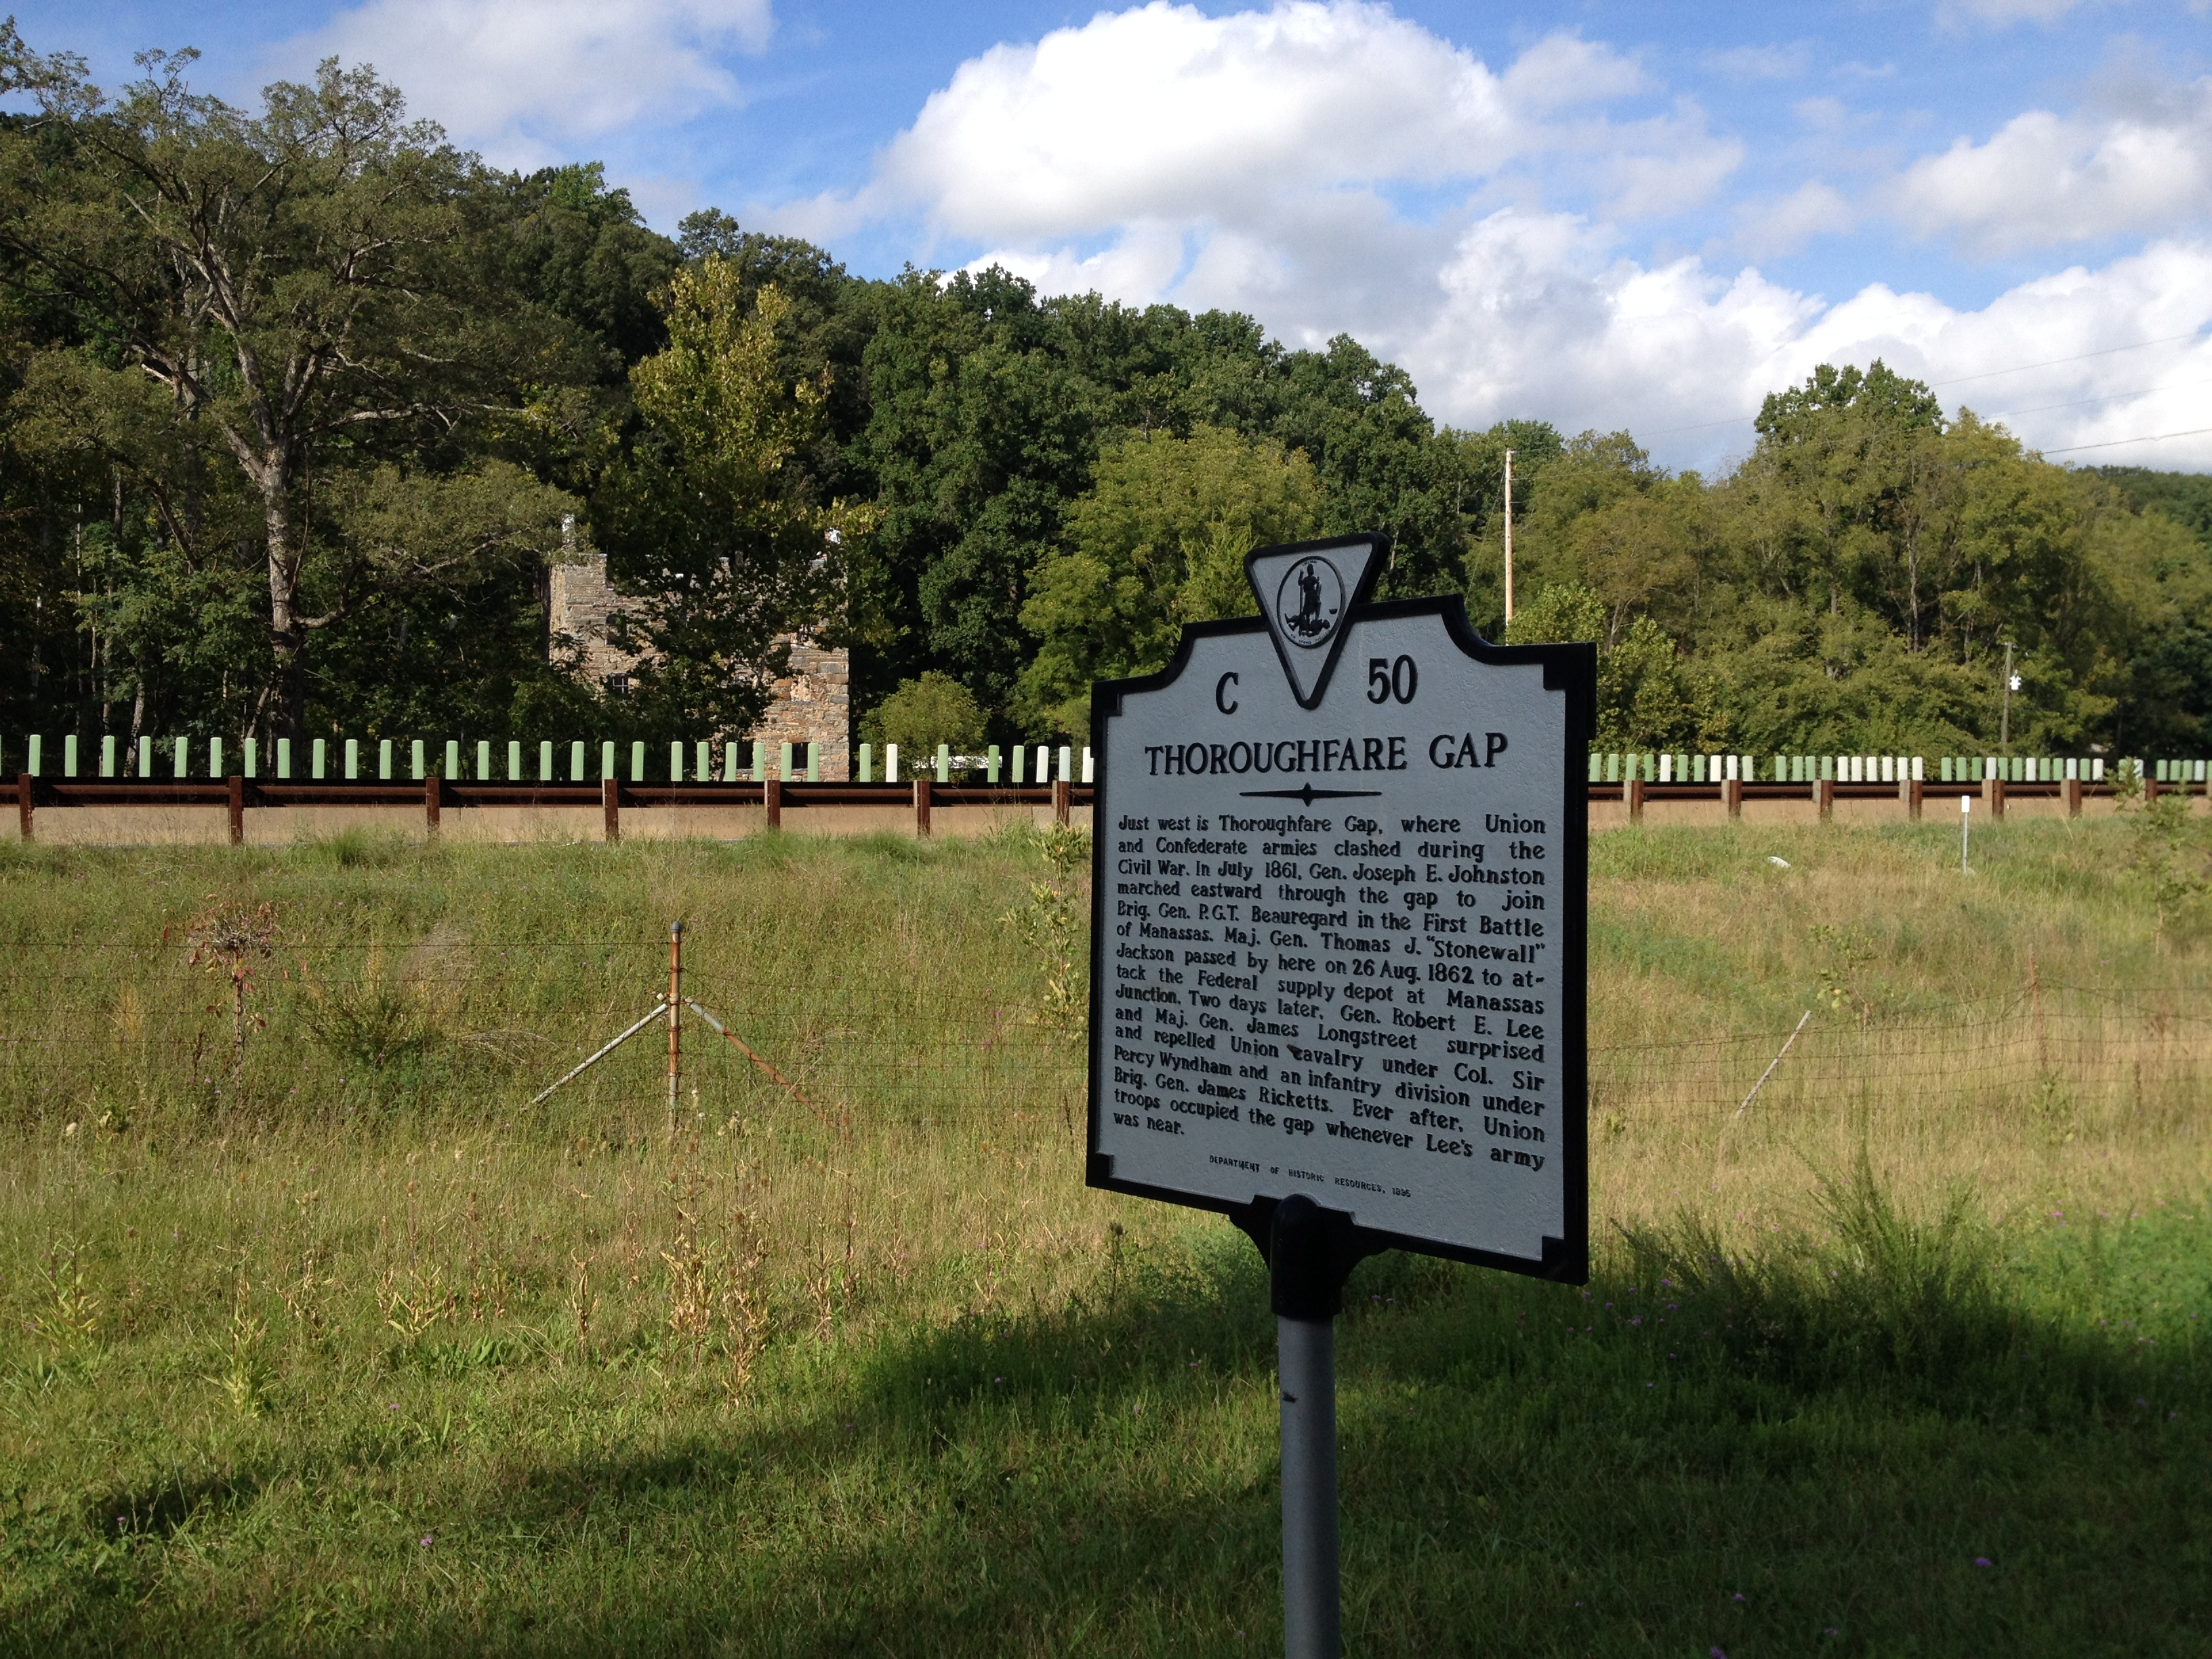 Thoroughfare Gap Battlefield - Wikipedia